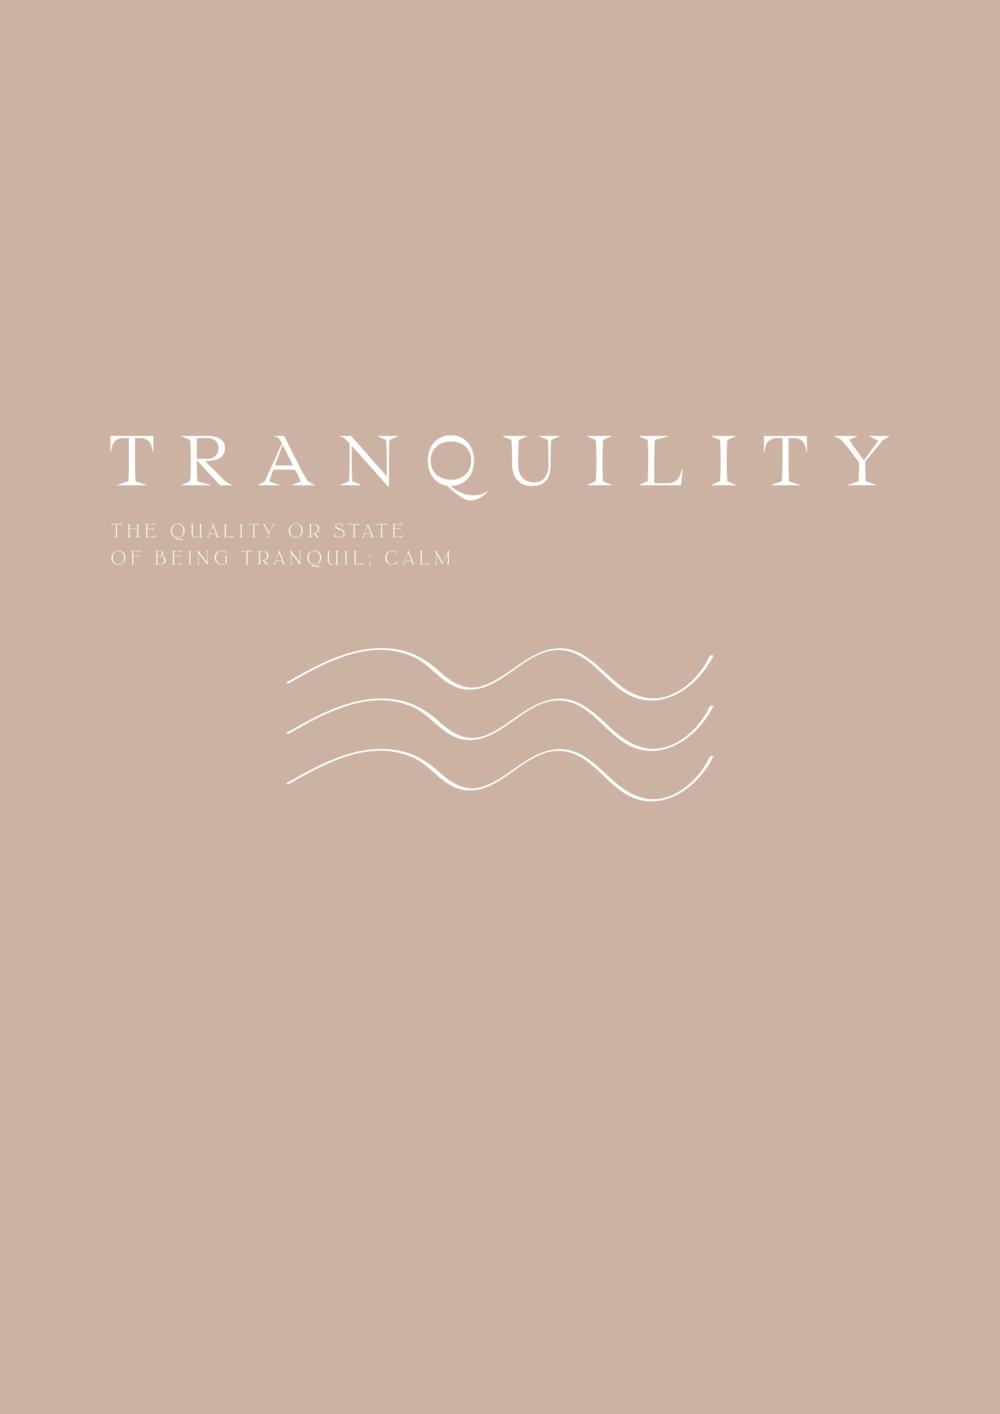 tranquility / phylleli design studio and blog